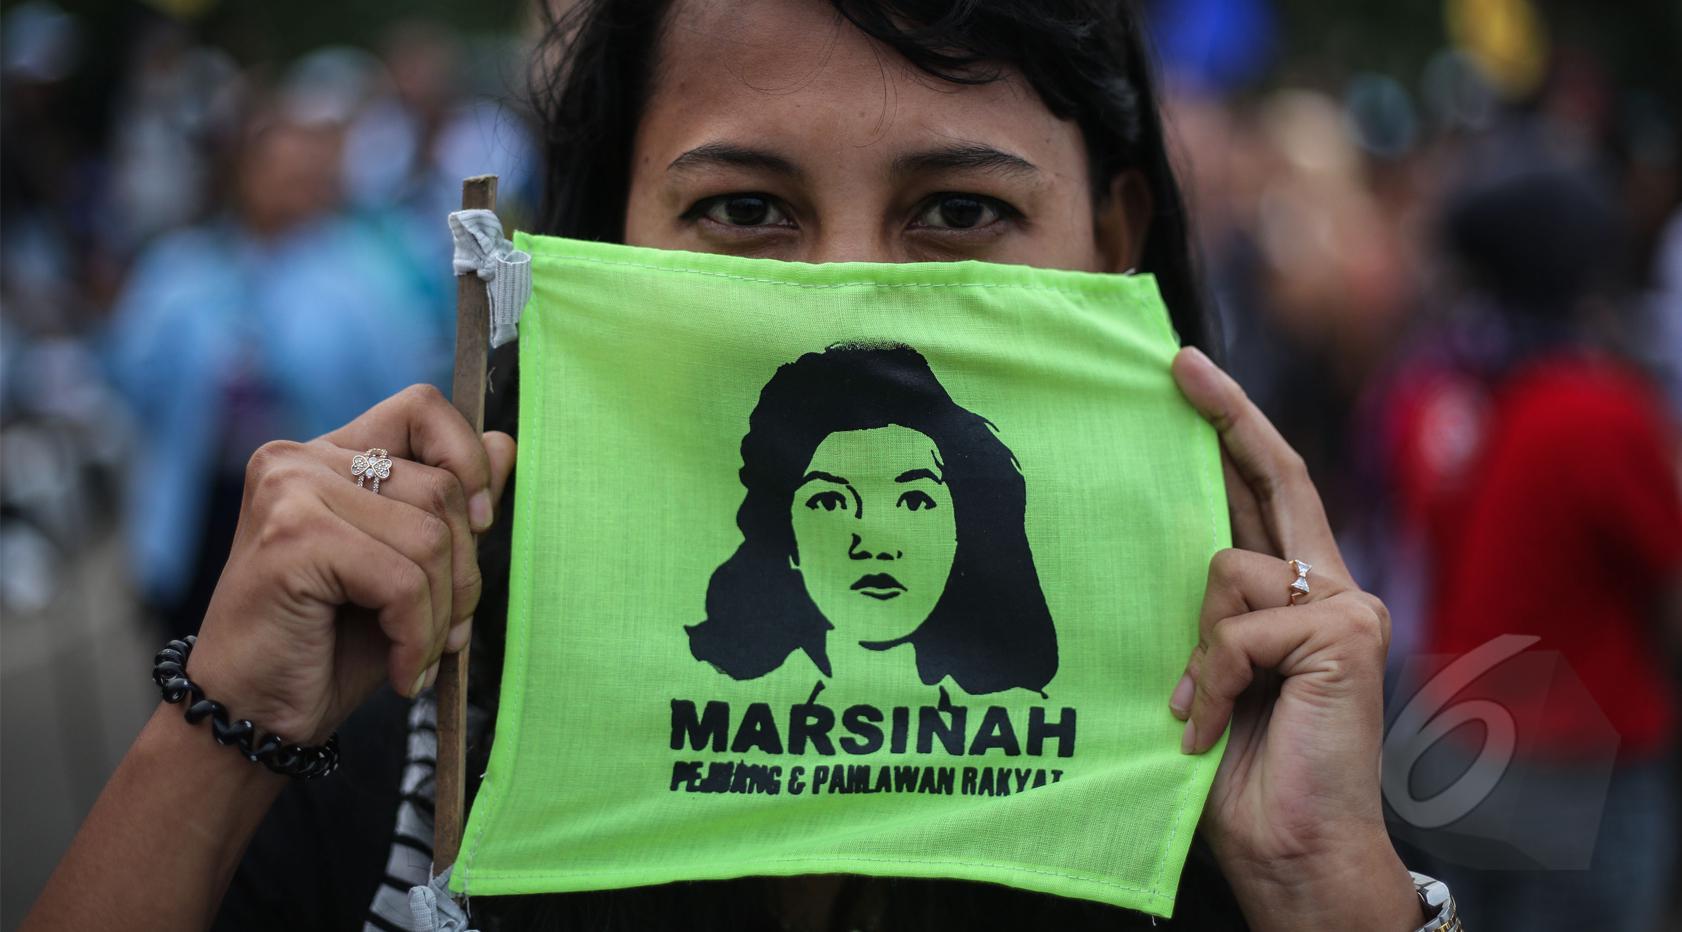 Para buruh yang tergabung dalam berbagai serikat menggelar aksi memperingati 22 tahun tanpa keadilan